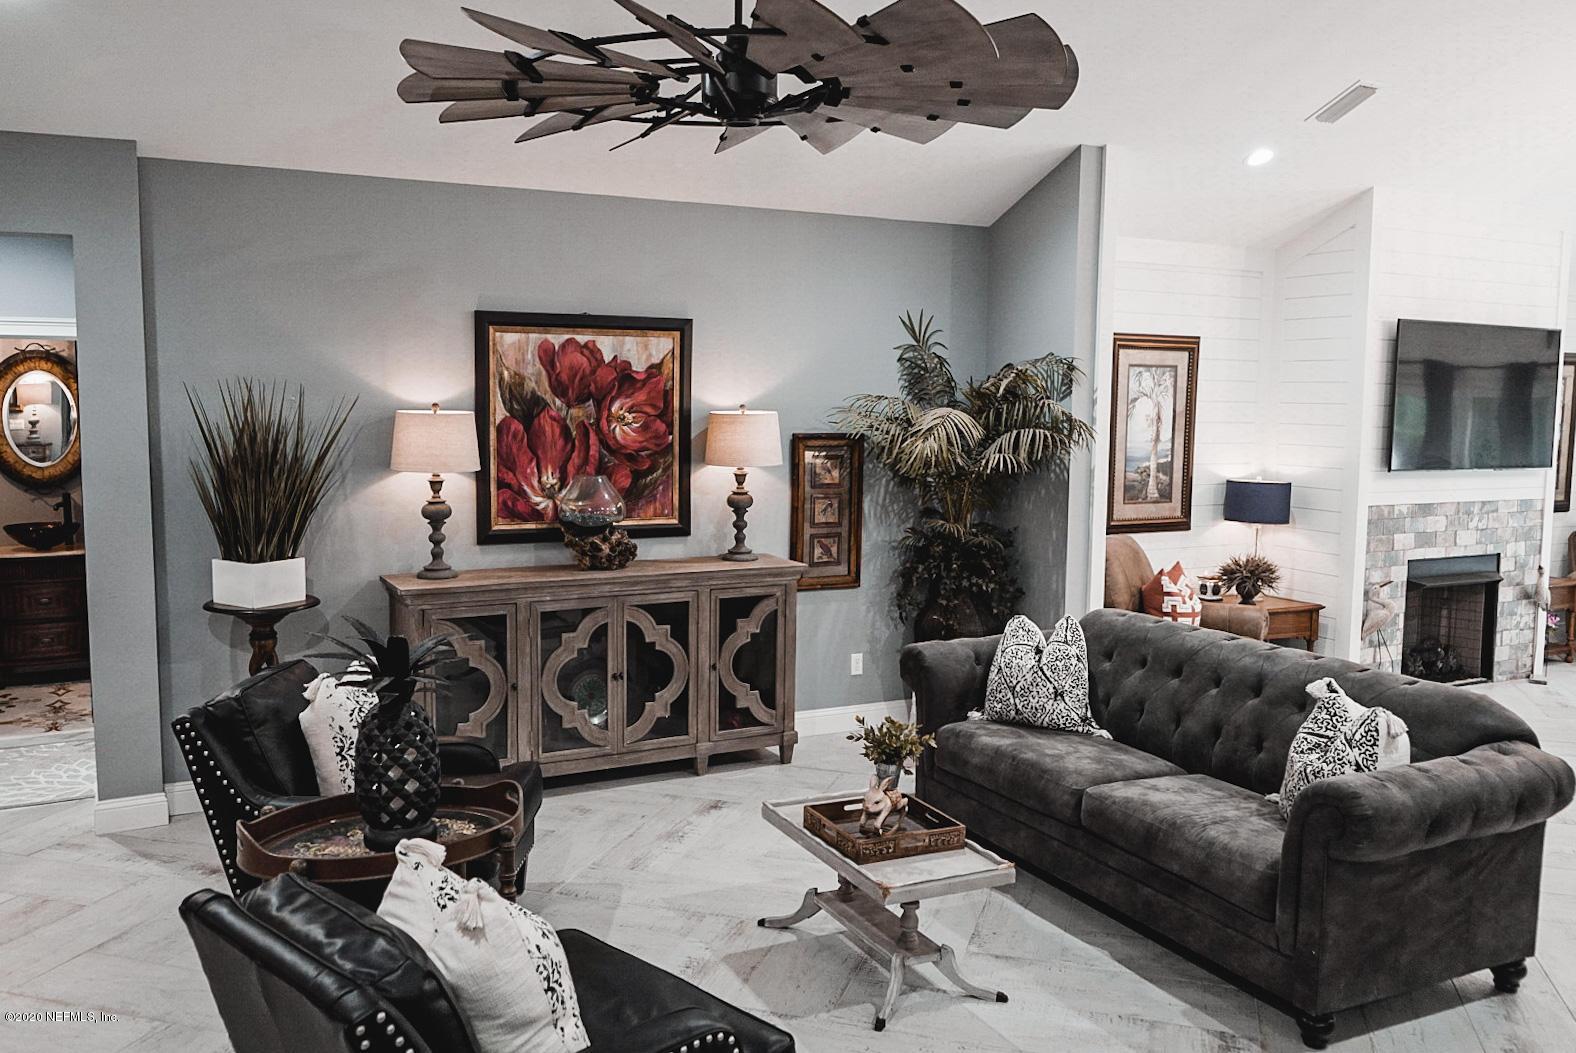 96026 HIGH POINTE, FERNANDINA BEACH, FLORIDA 32034, 4 Bedrooms Bedrooms, ,2 BathroomsBathrooms,Residential,For sale,HIGH POINTE,1082383